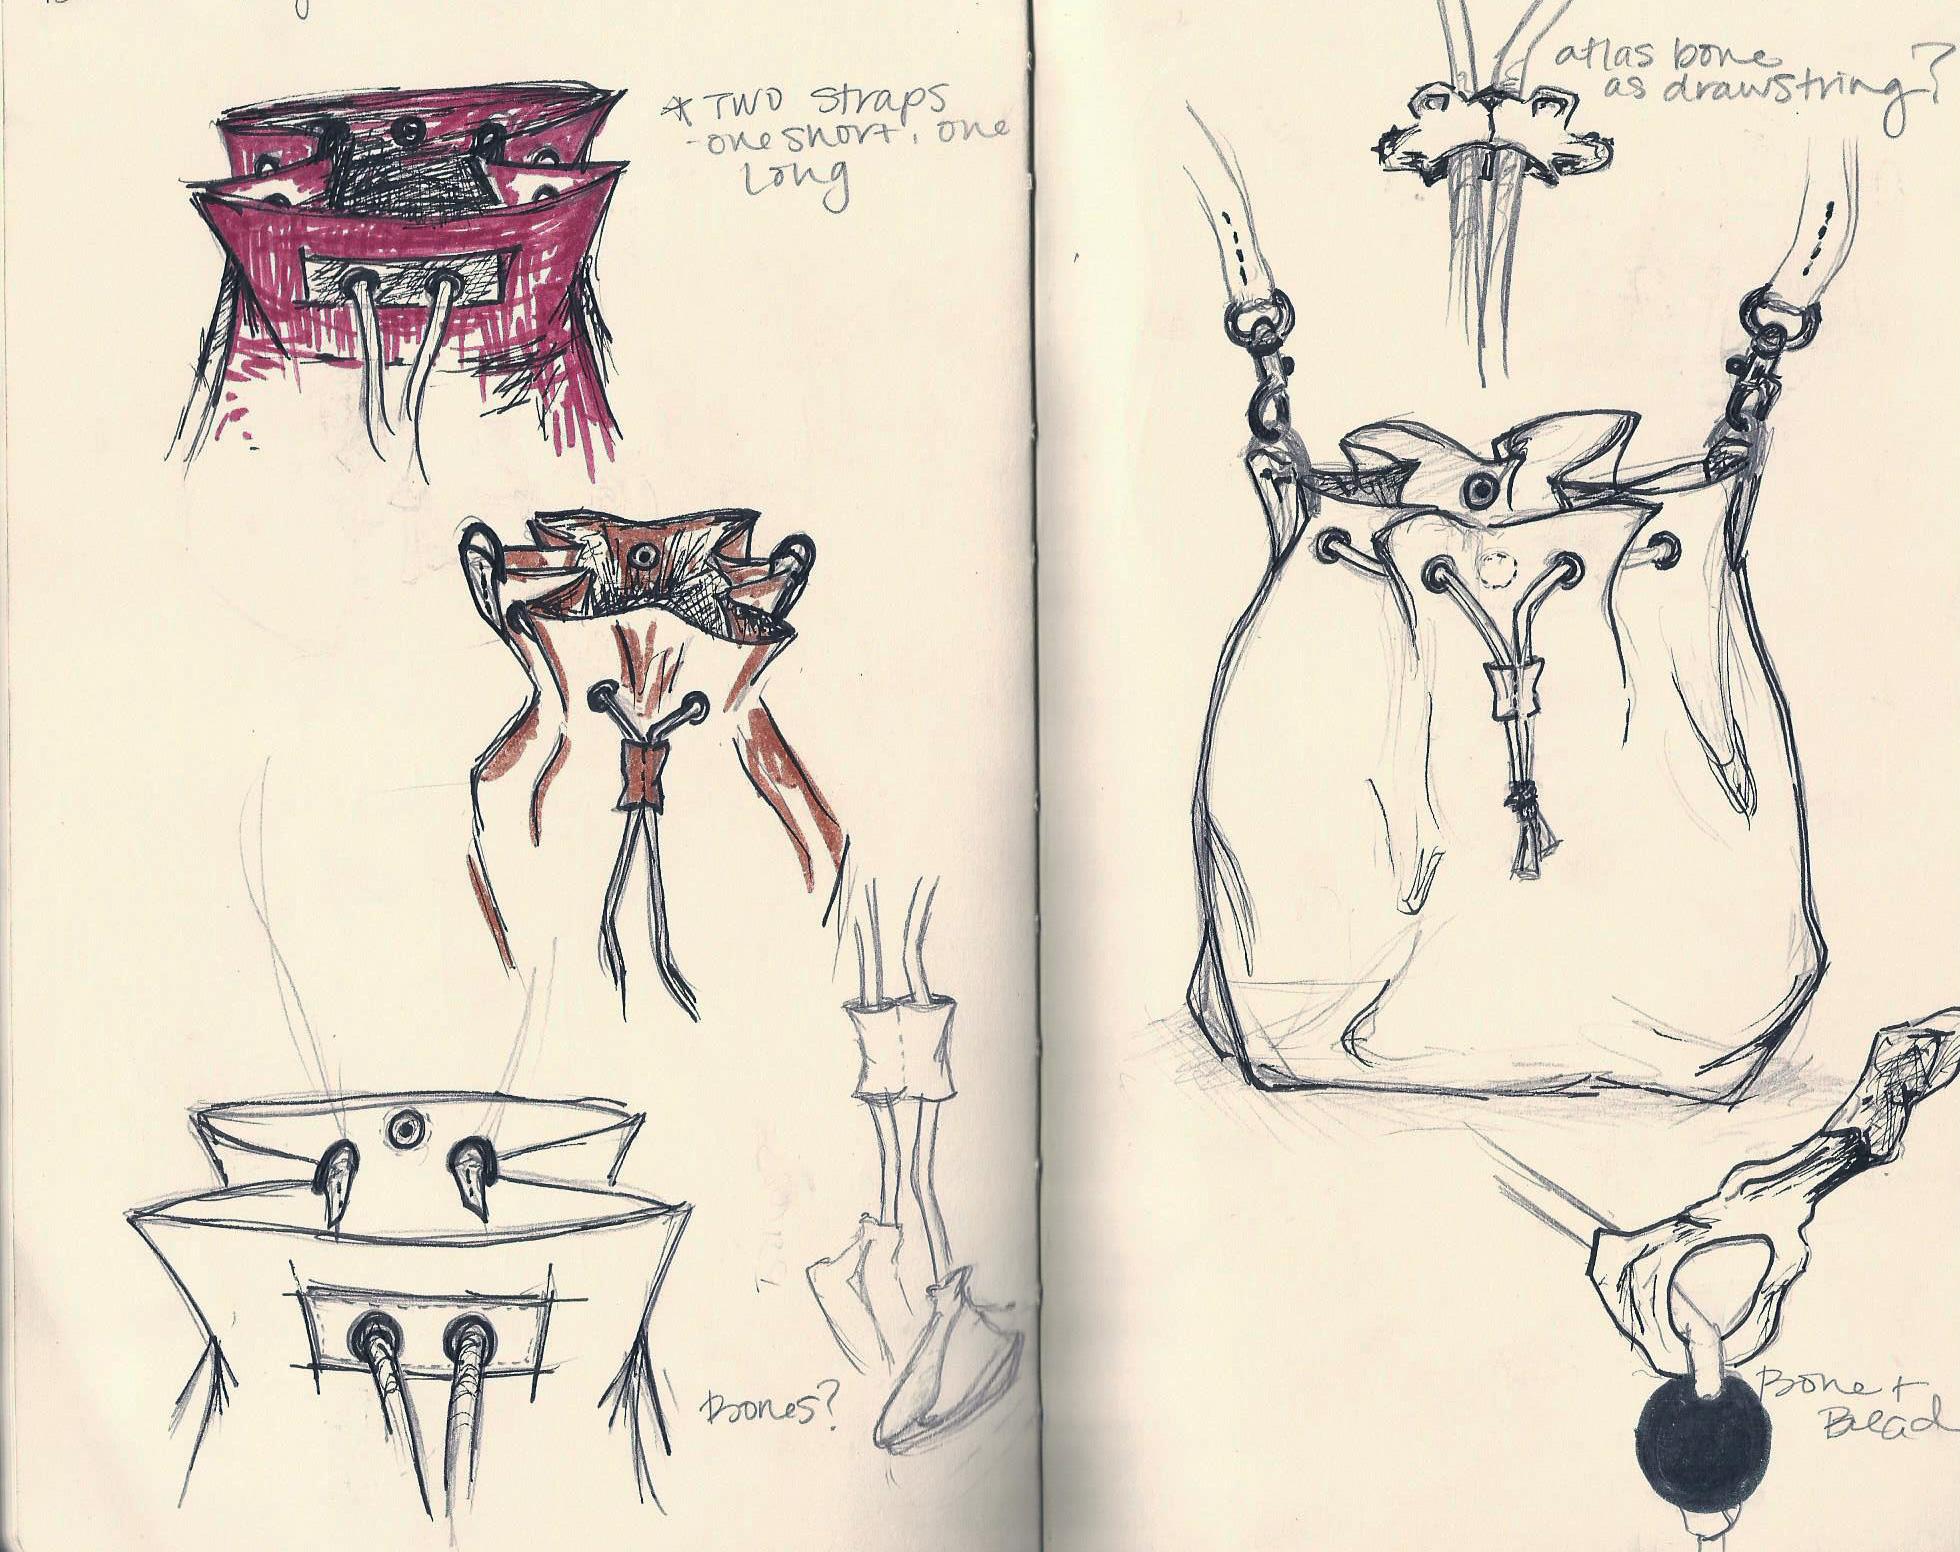 Jenna-Lagonigro-Sketchbook-4.jpg